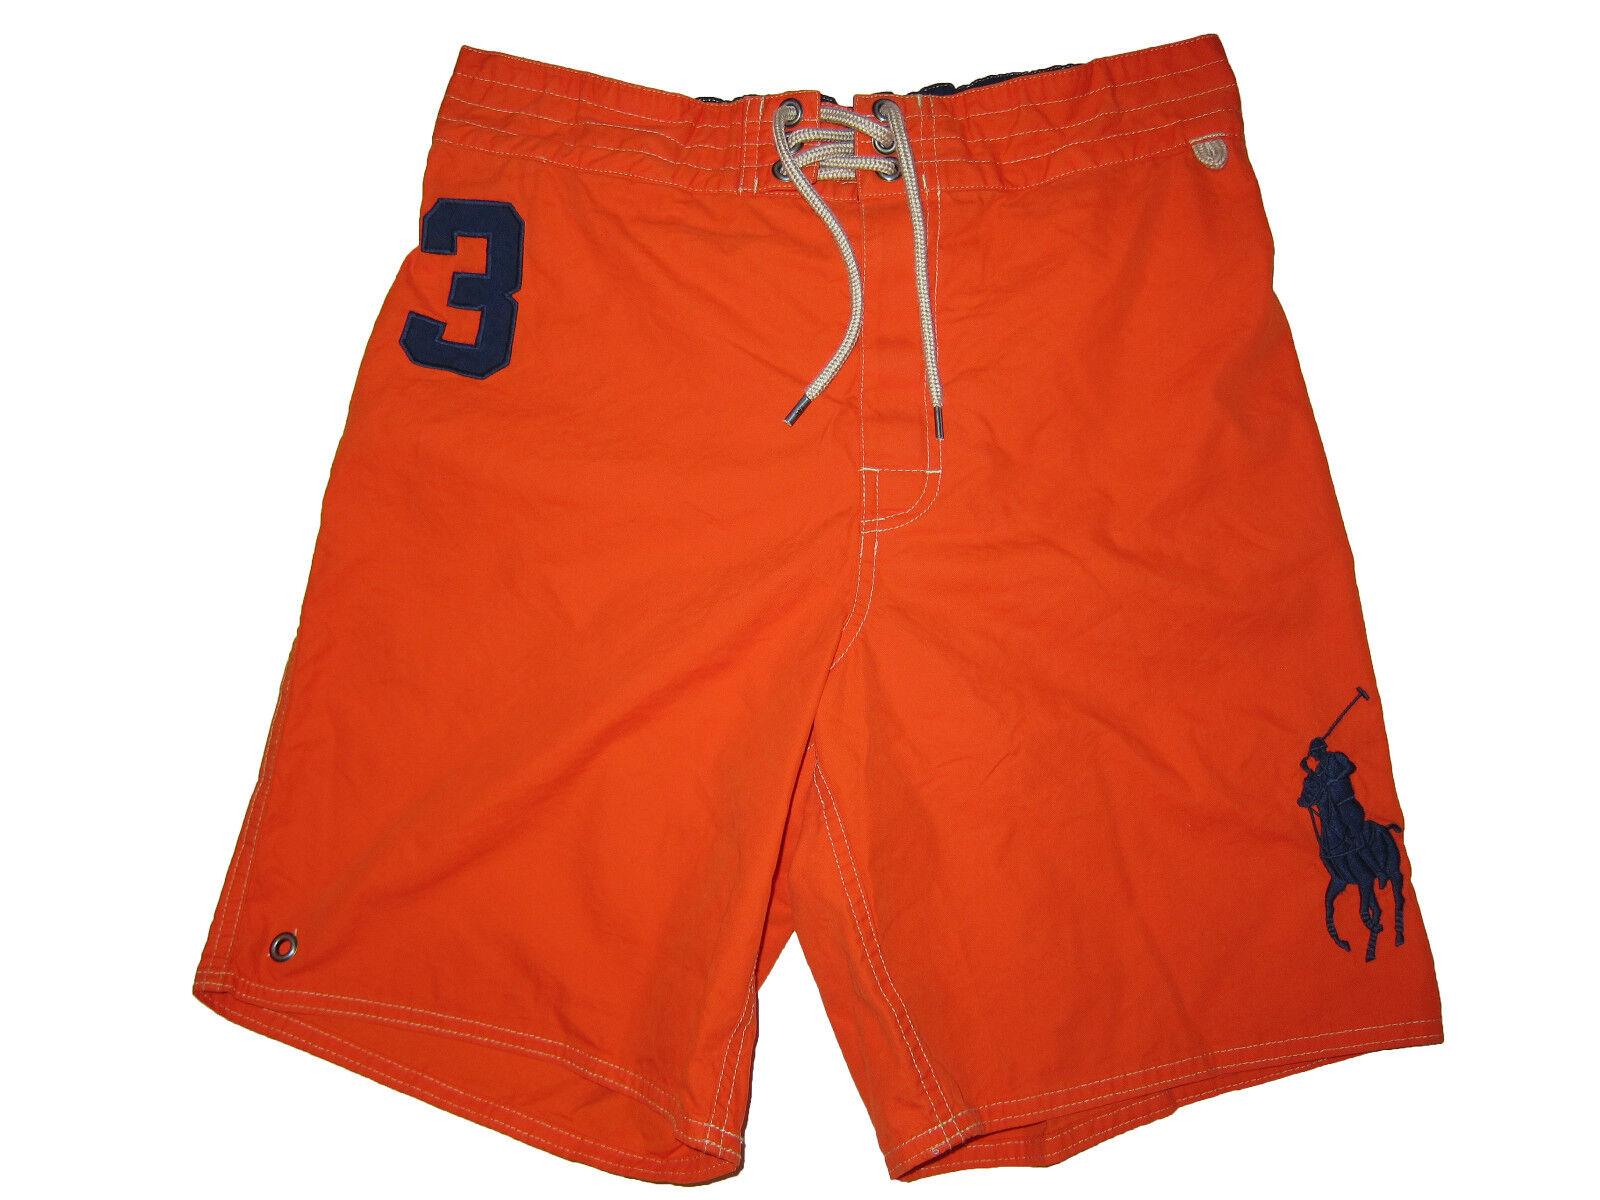 Polo Ralph Lauren orange Navy bluee Big Pony Swim Surf Board Shorts Suit Small